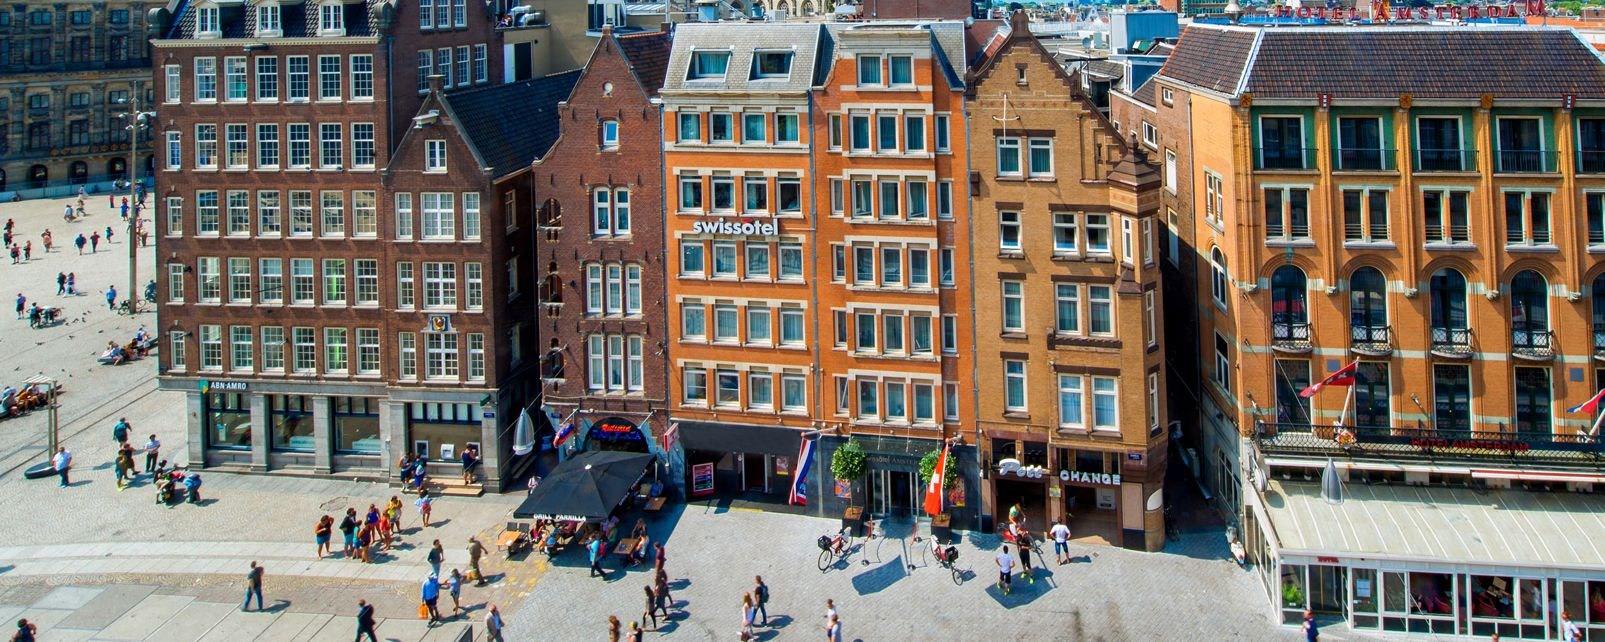 Hotel Swissotel Amsterdam